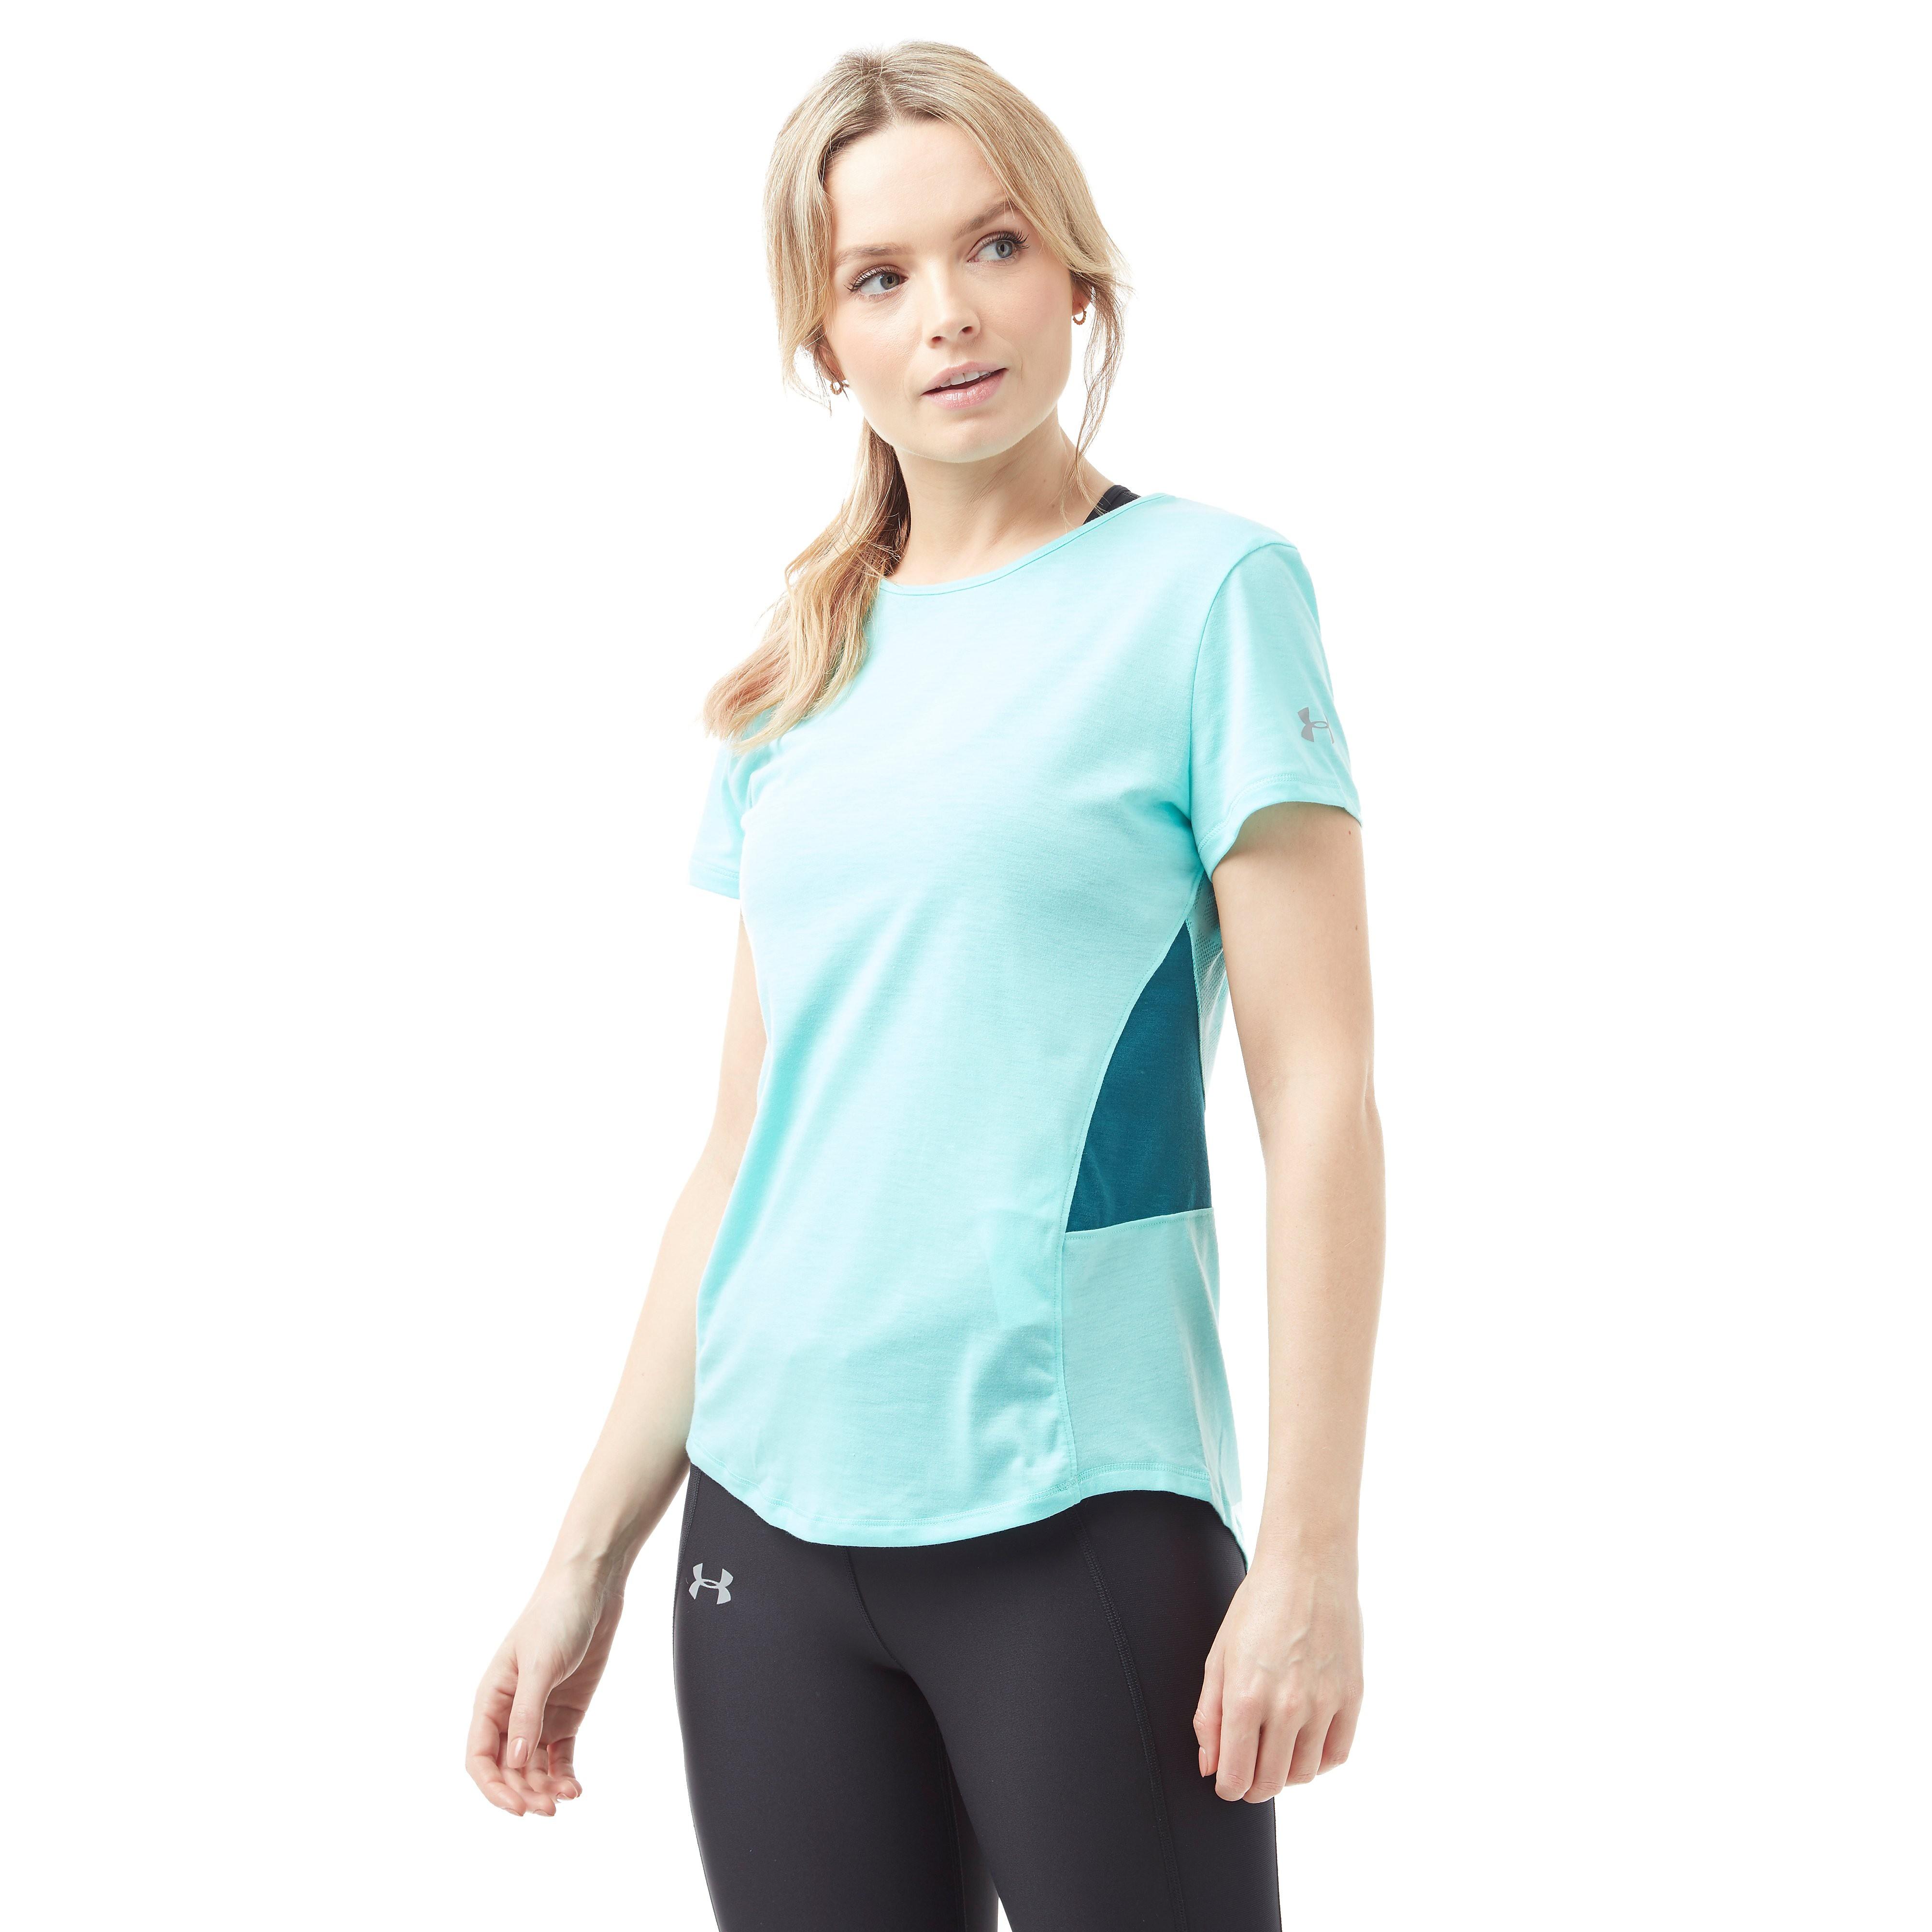 Under Armour Thread Swyft Women's T-Shirt